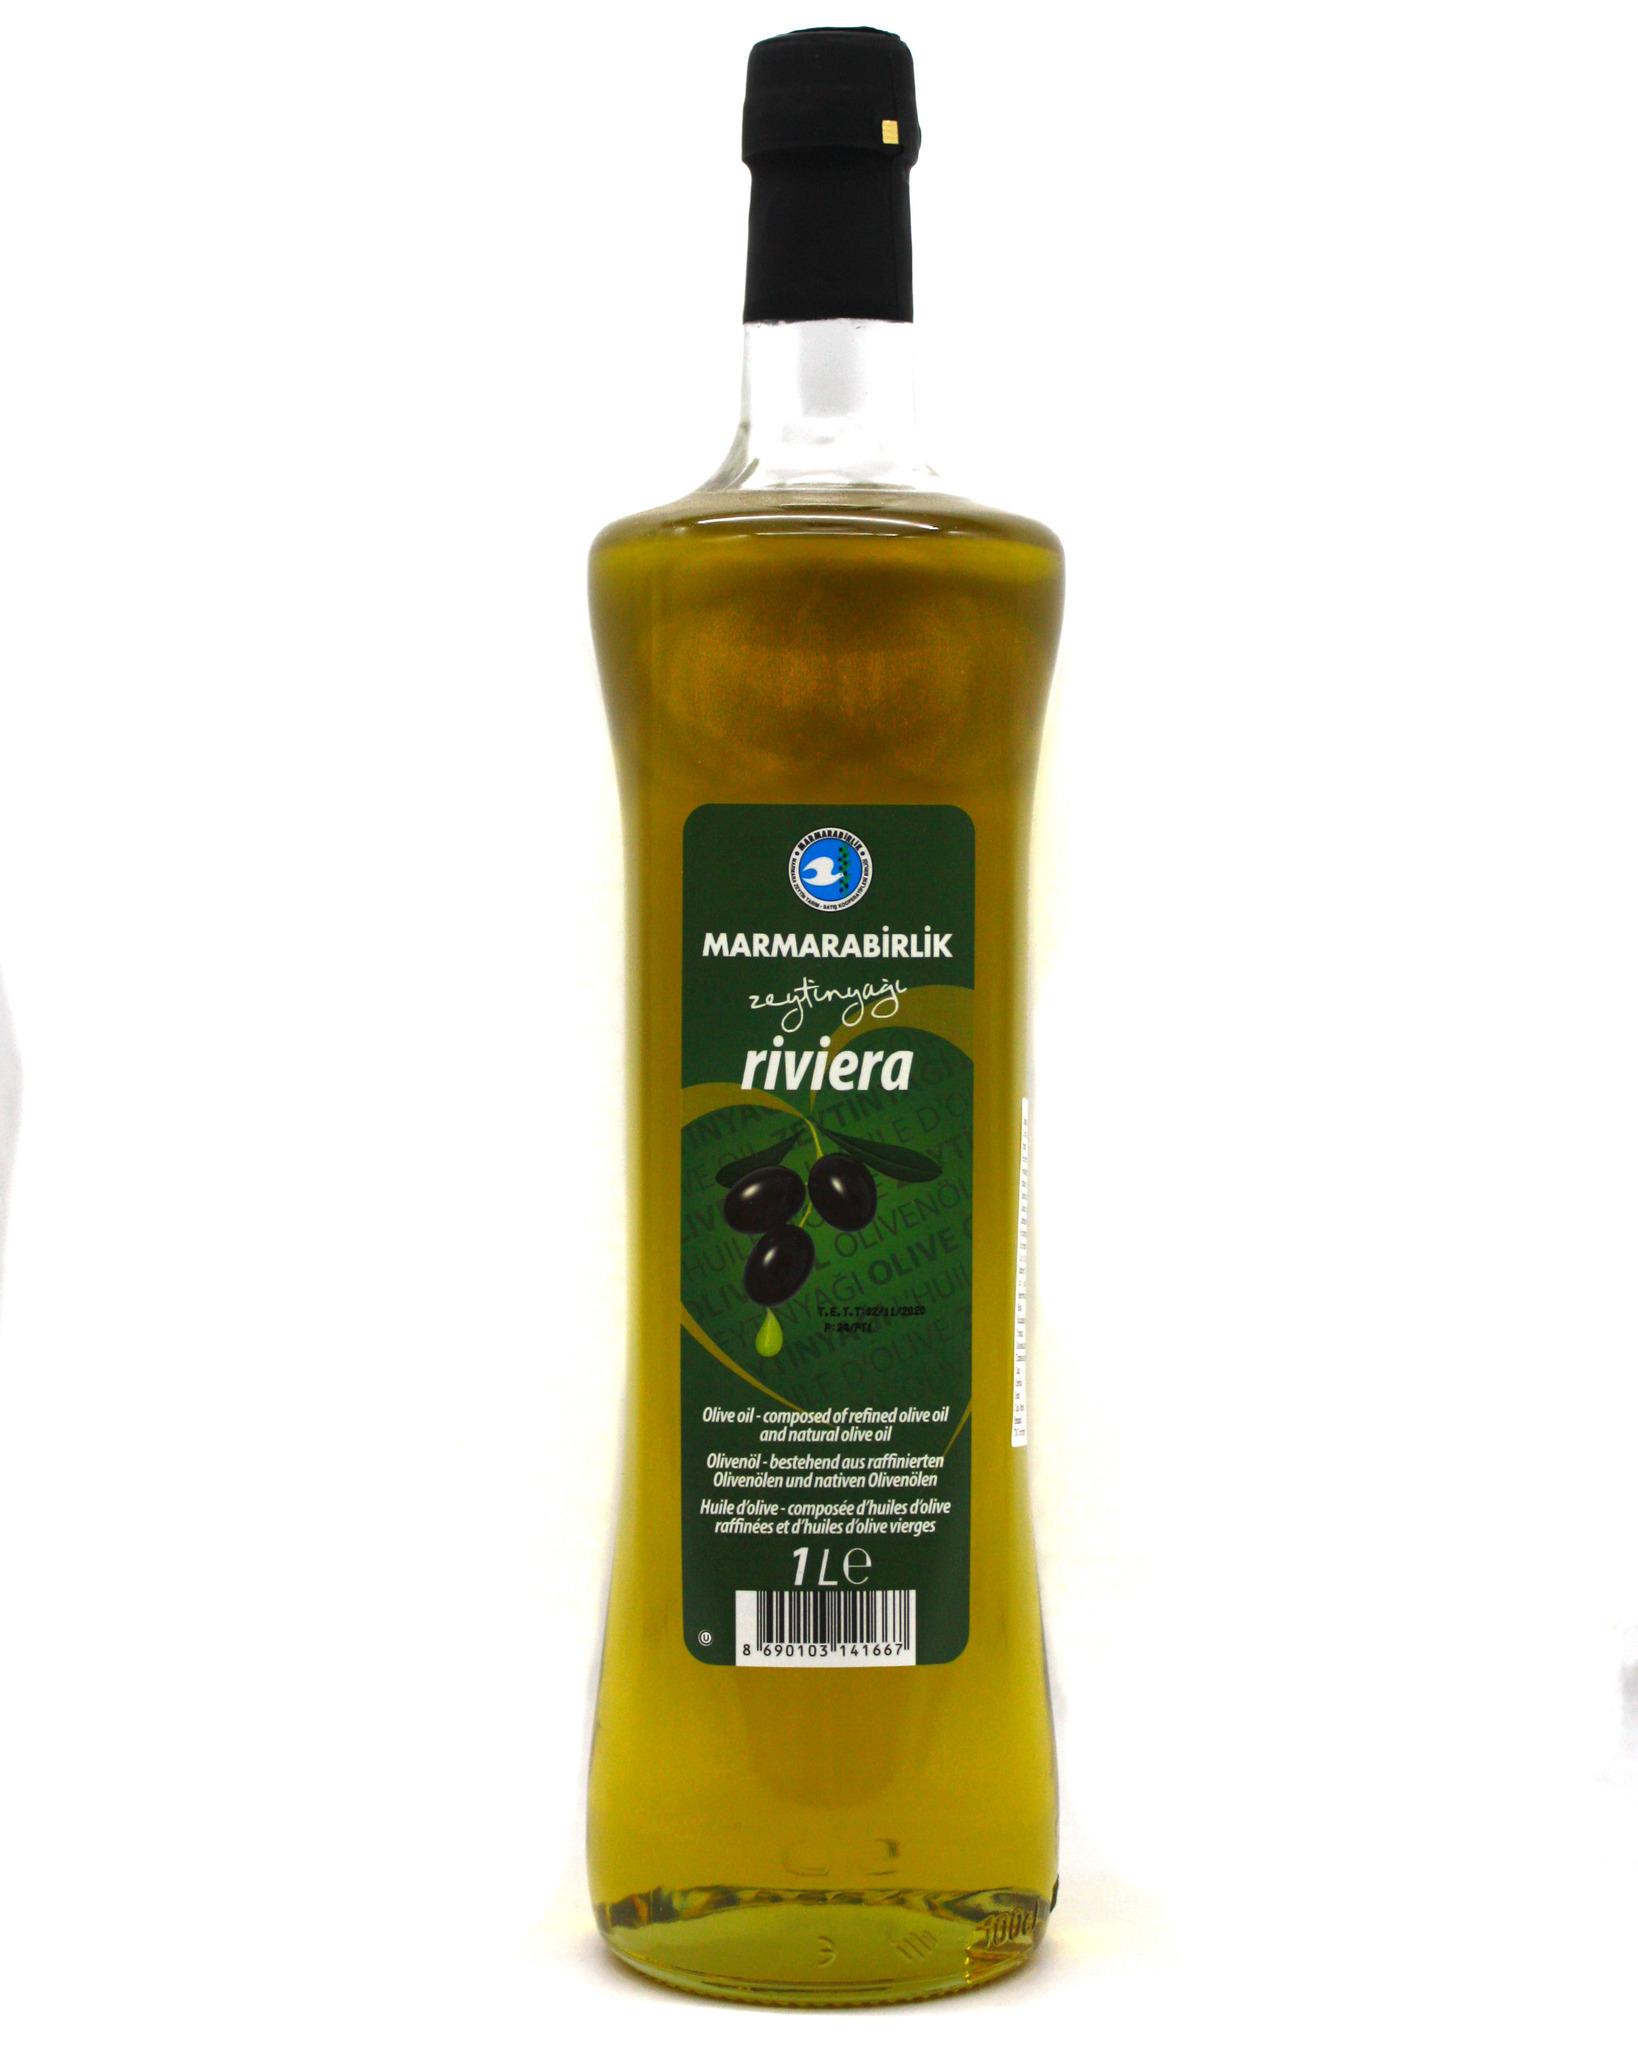 Оливковое масло Оливковое масло Riviera Extra Virgin, Marmarabirlik, 1 л import_files_8f_8f3e6141996d11e9a9ad484d7ecee297_d17e1ffca2e211e9a9ae484d7ecee297.jpg